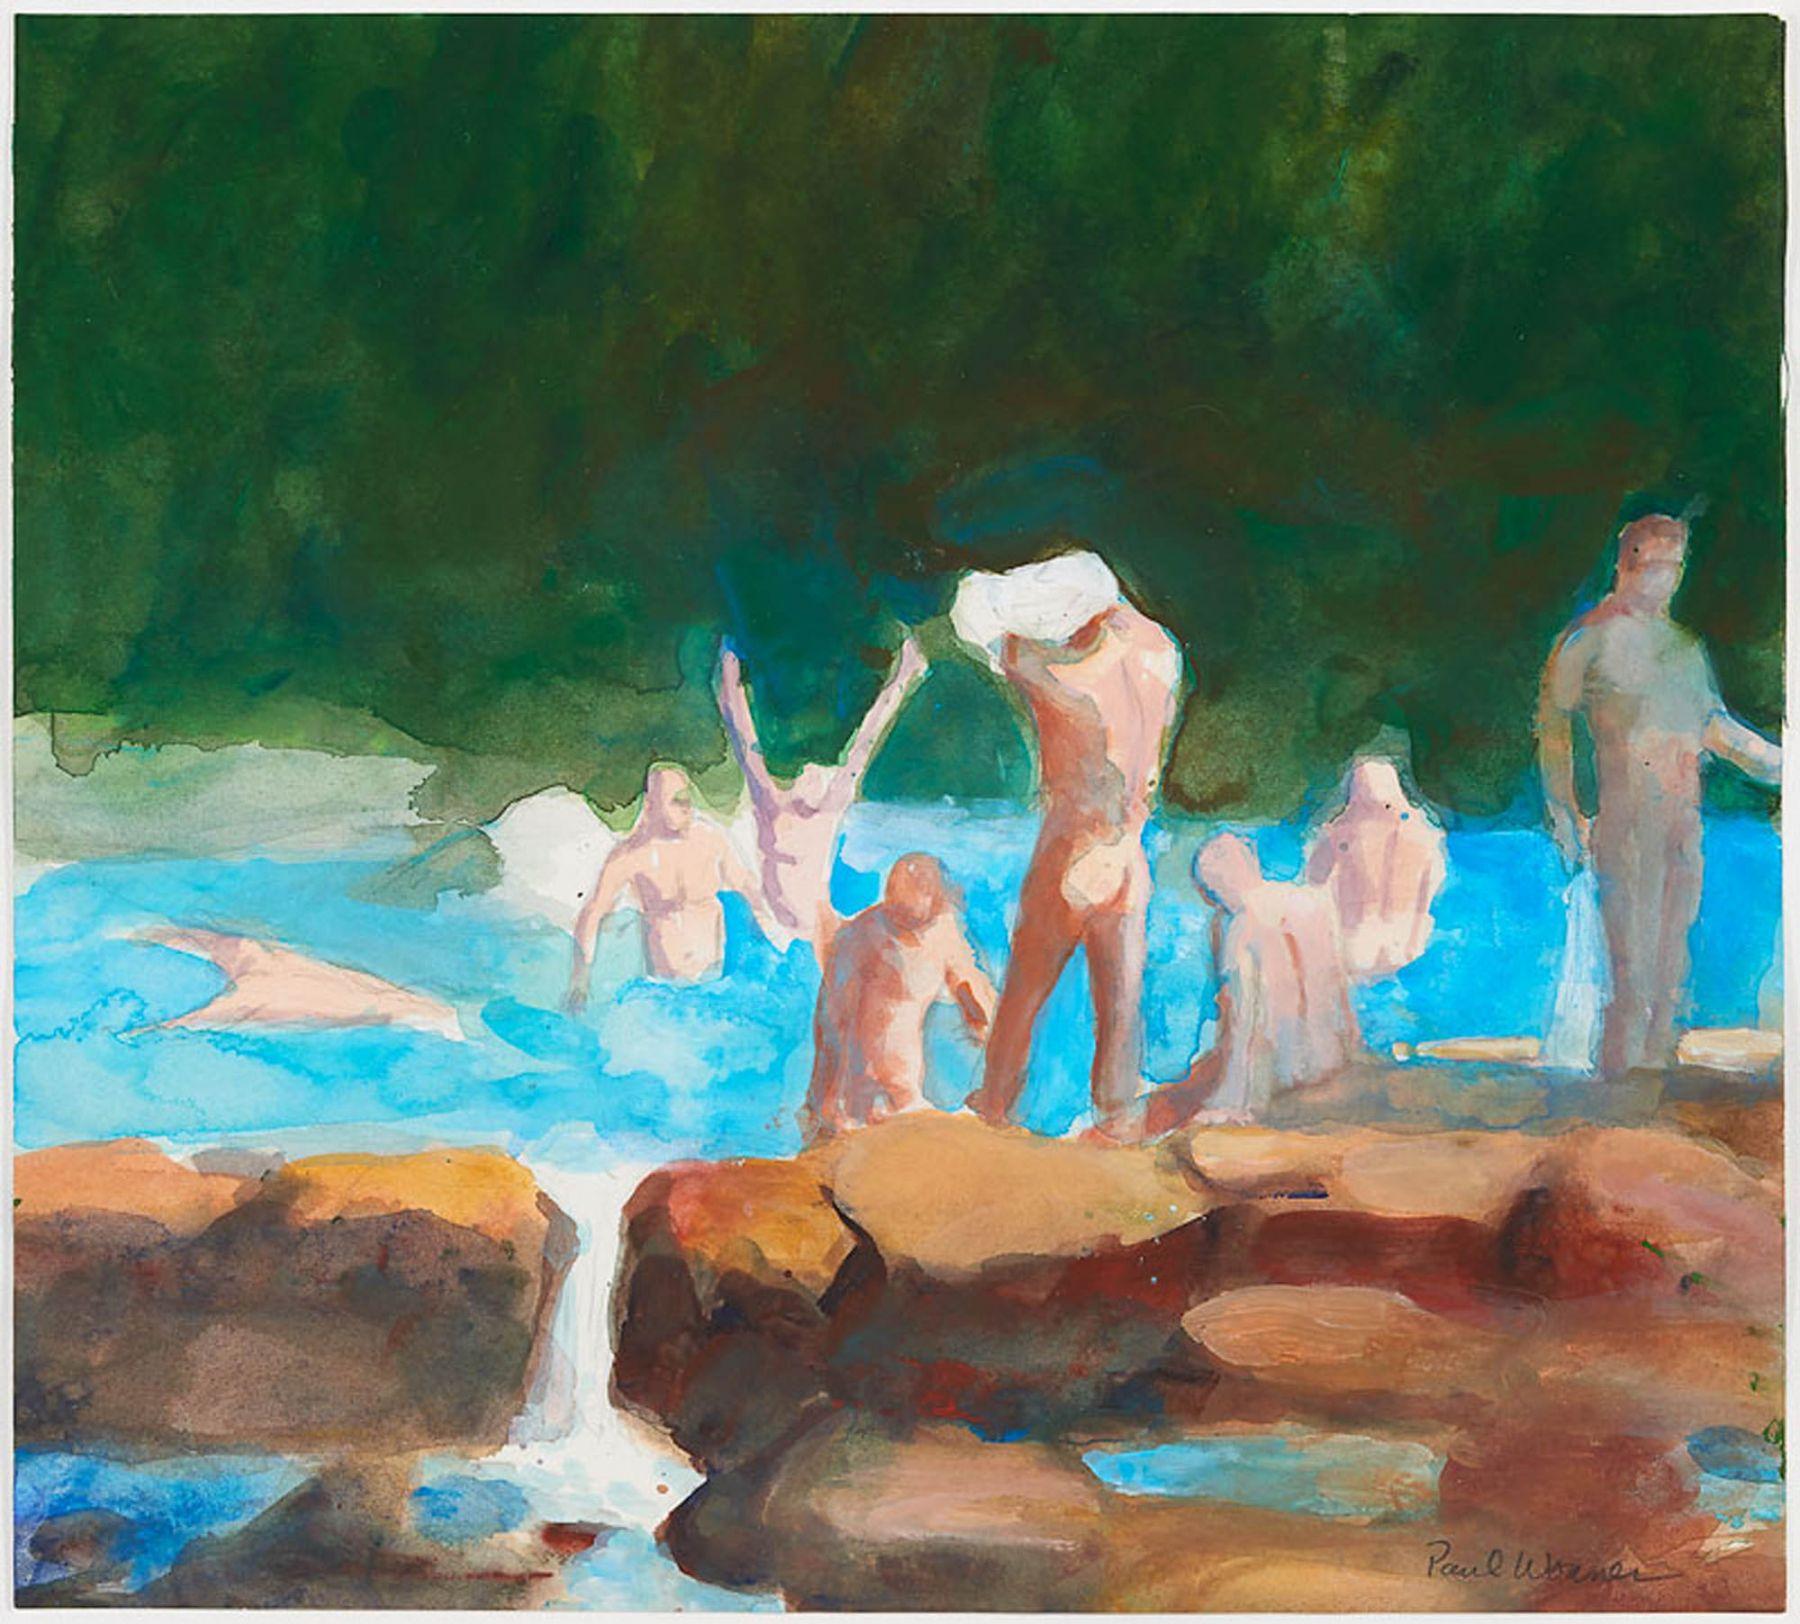 Paul Wonner, Bathers, 2003